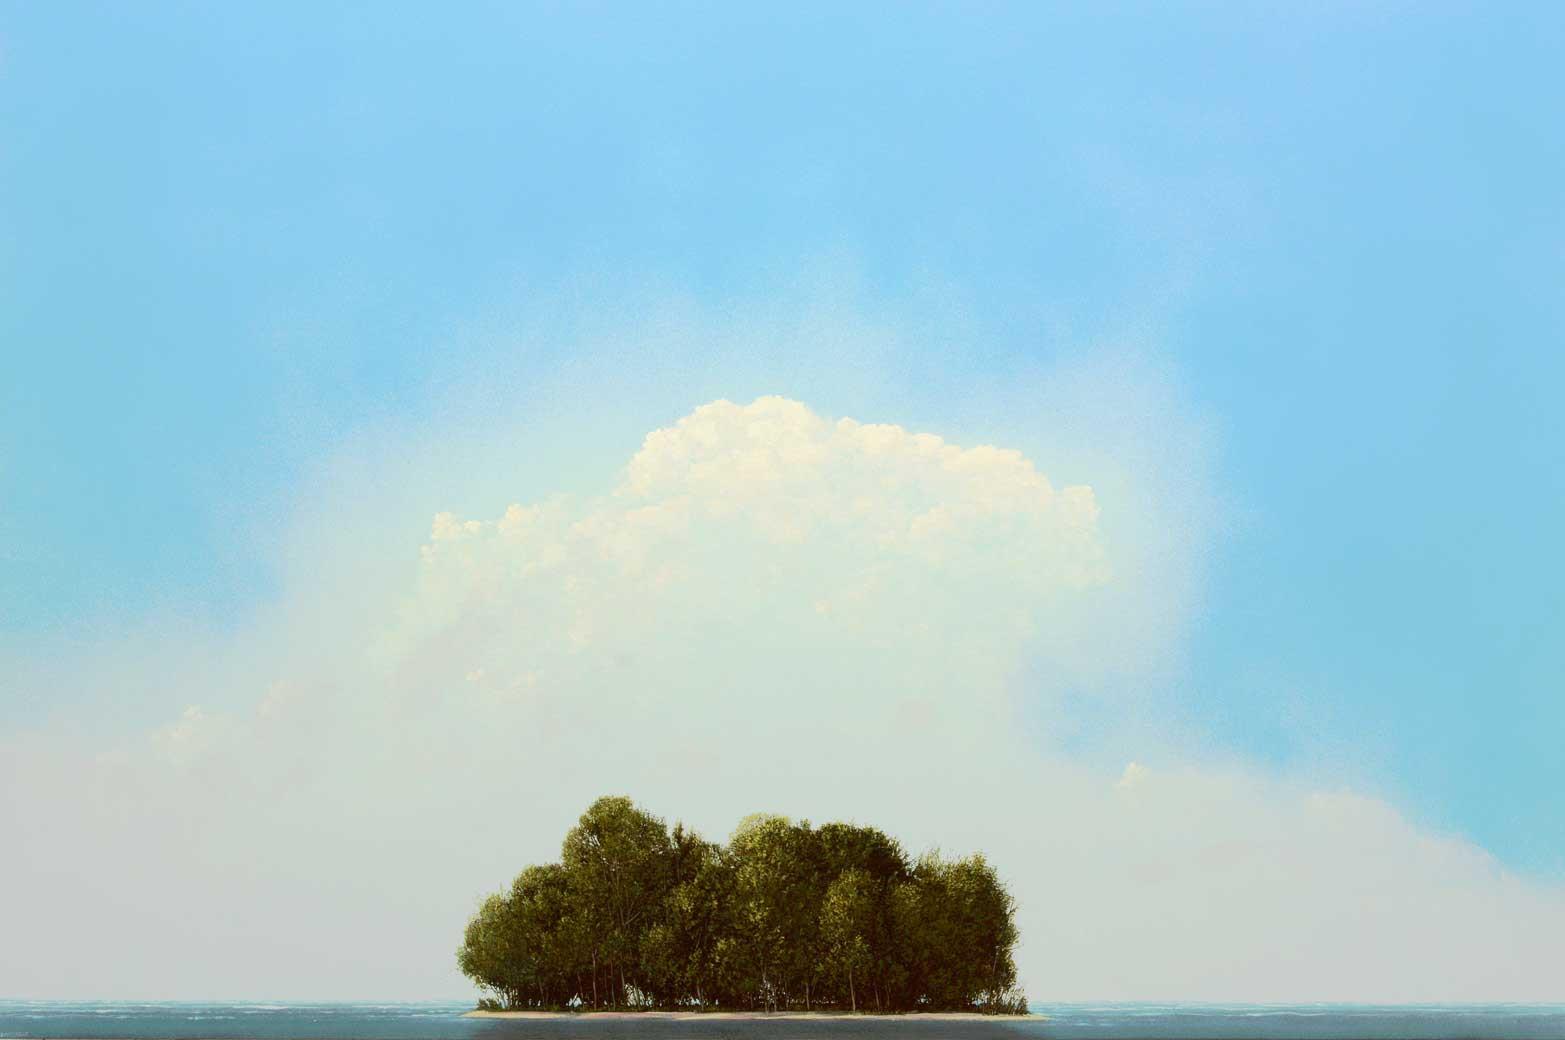 Amoza amoza-island,robert marchessault